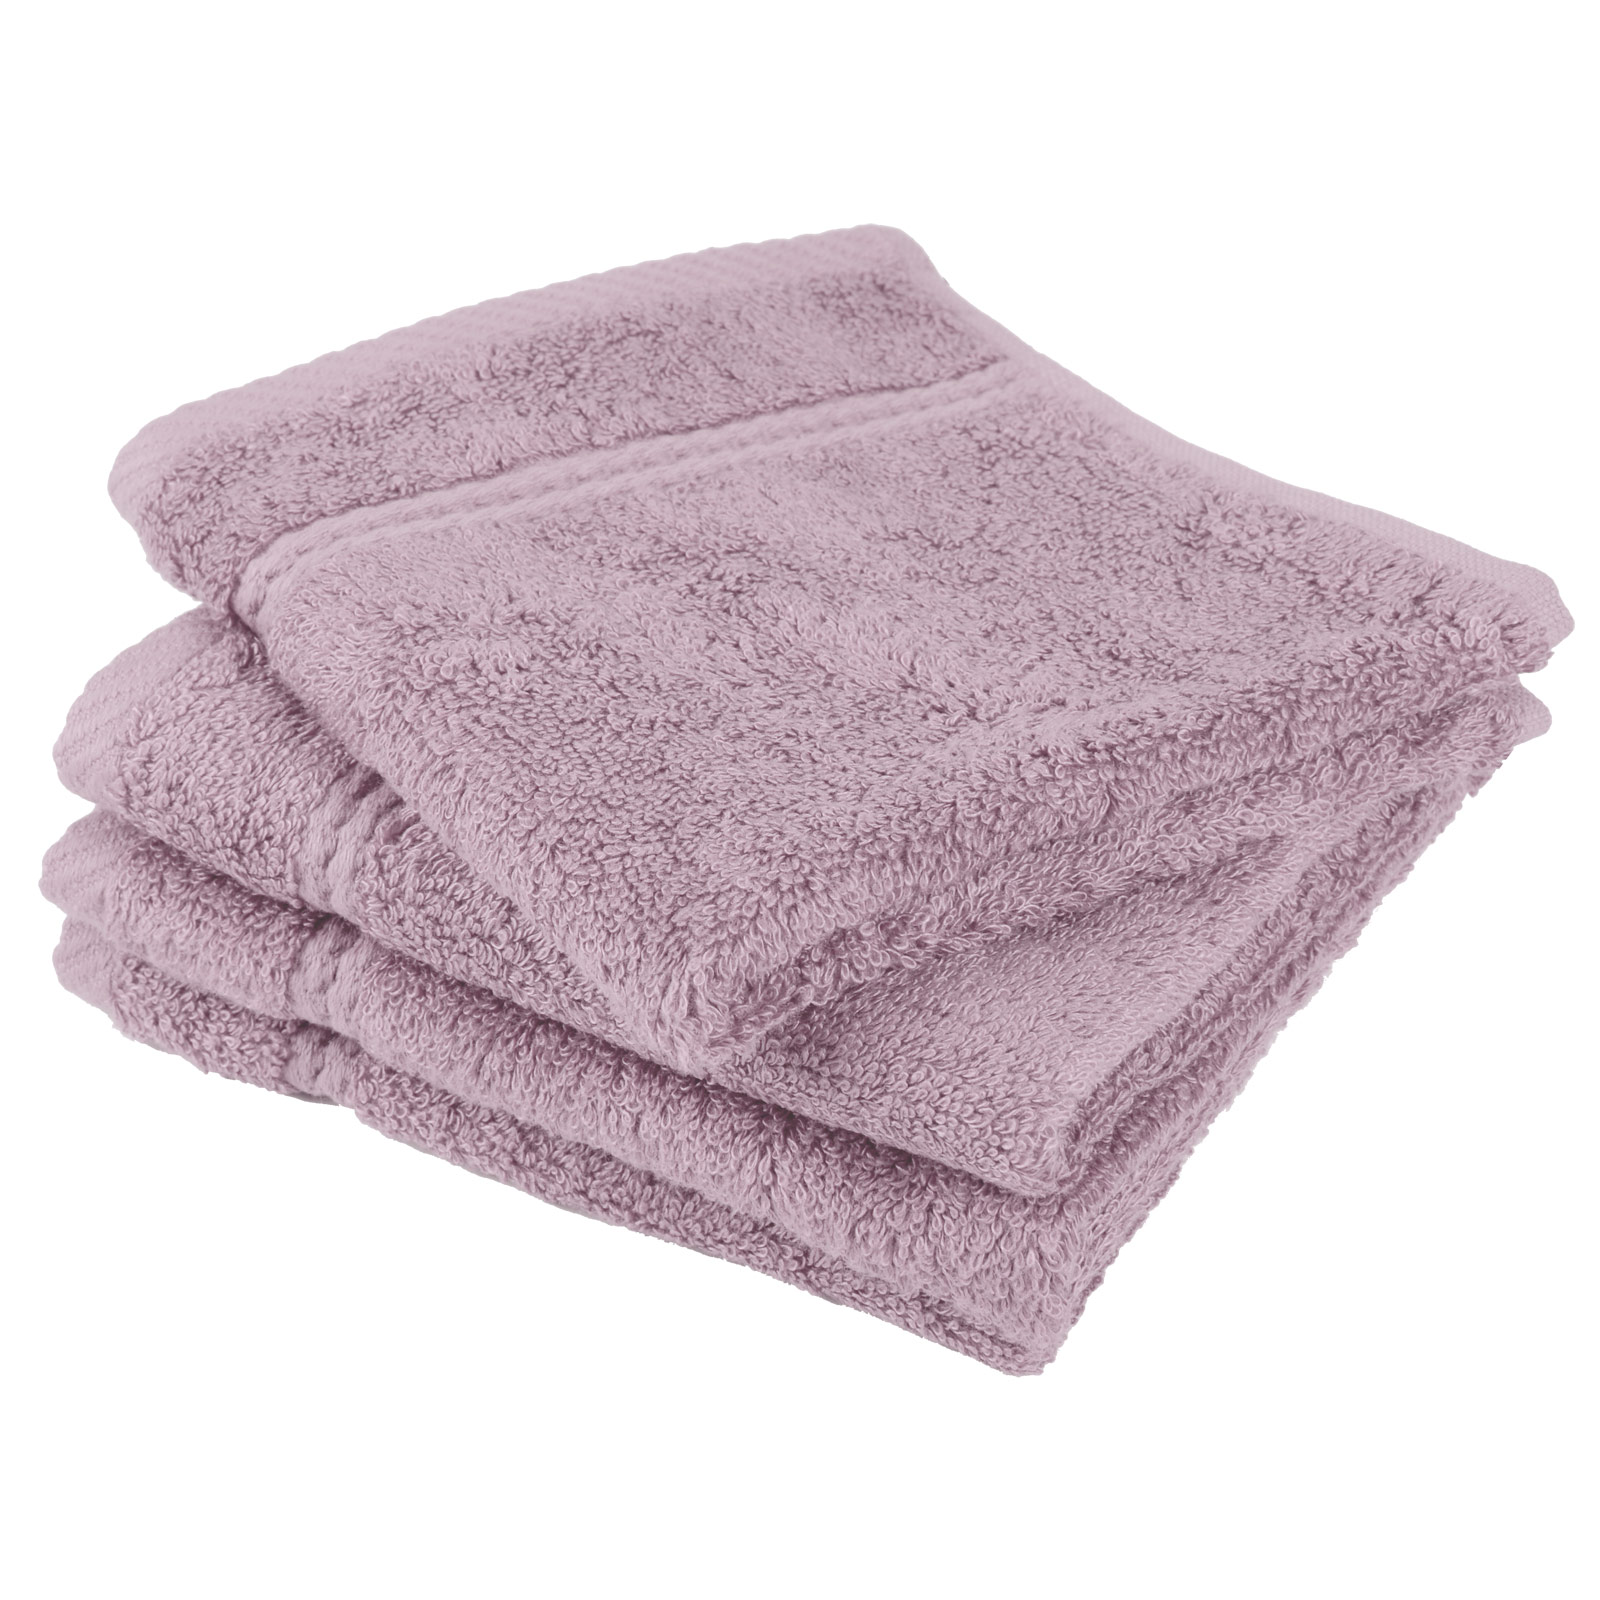 Bathroom Linen Bath Sheet Bath Towel Hand Towels Face Cloth 22 Colours Ebay